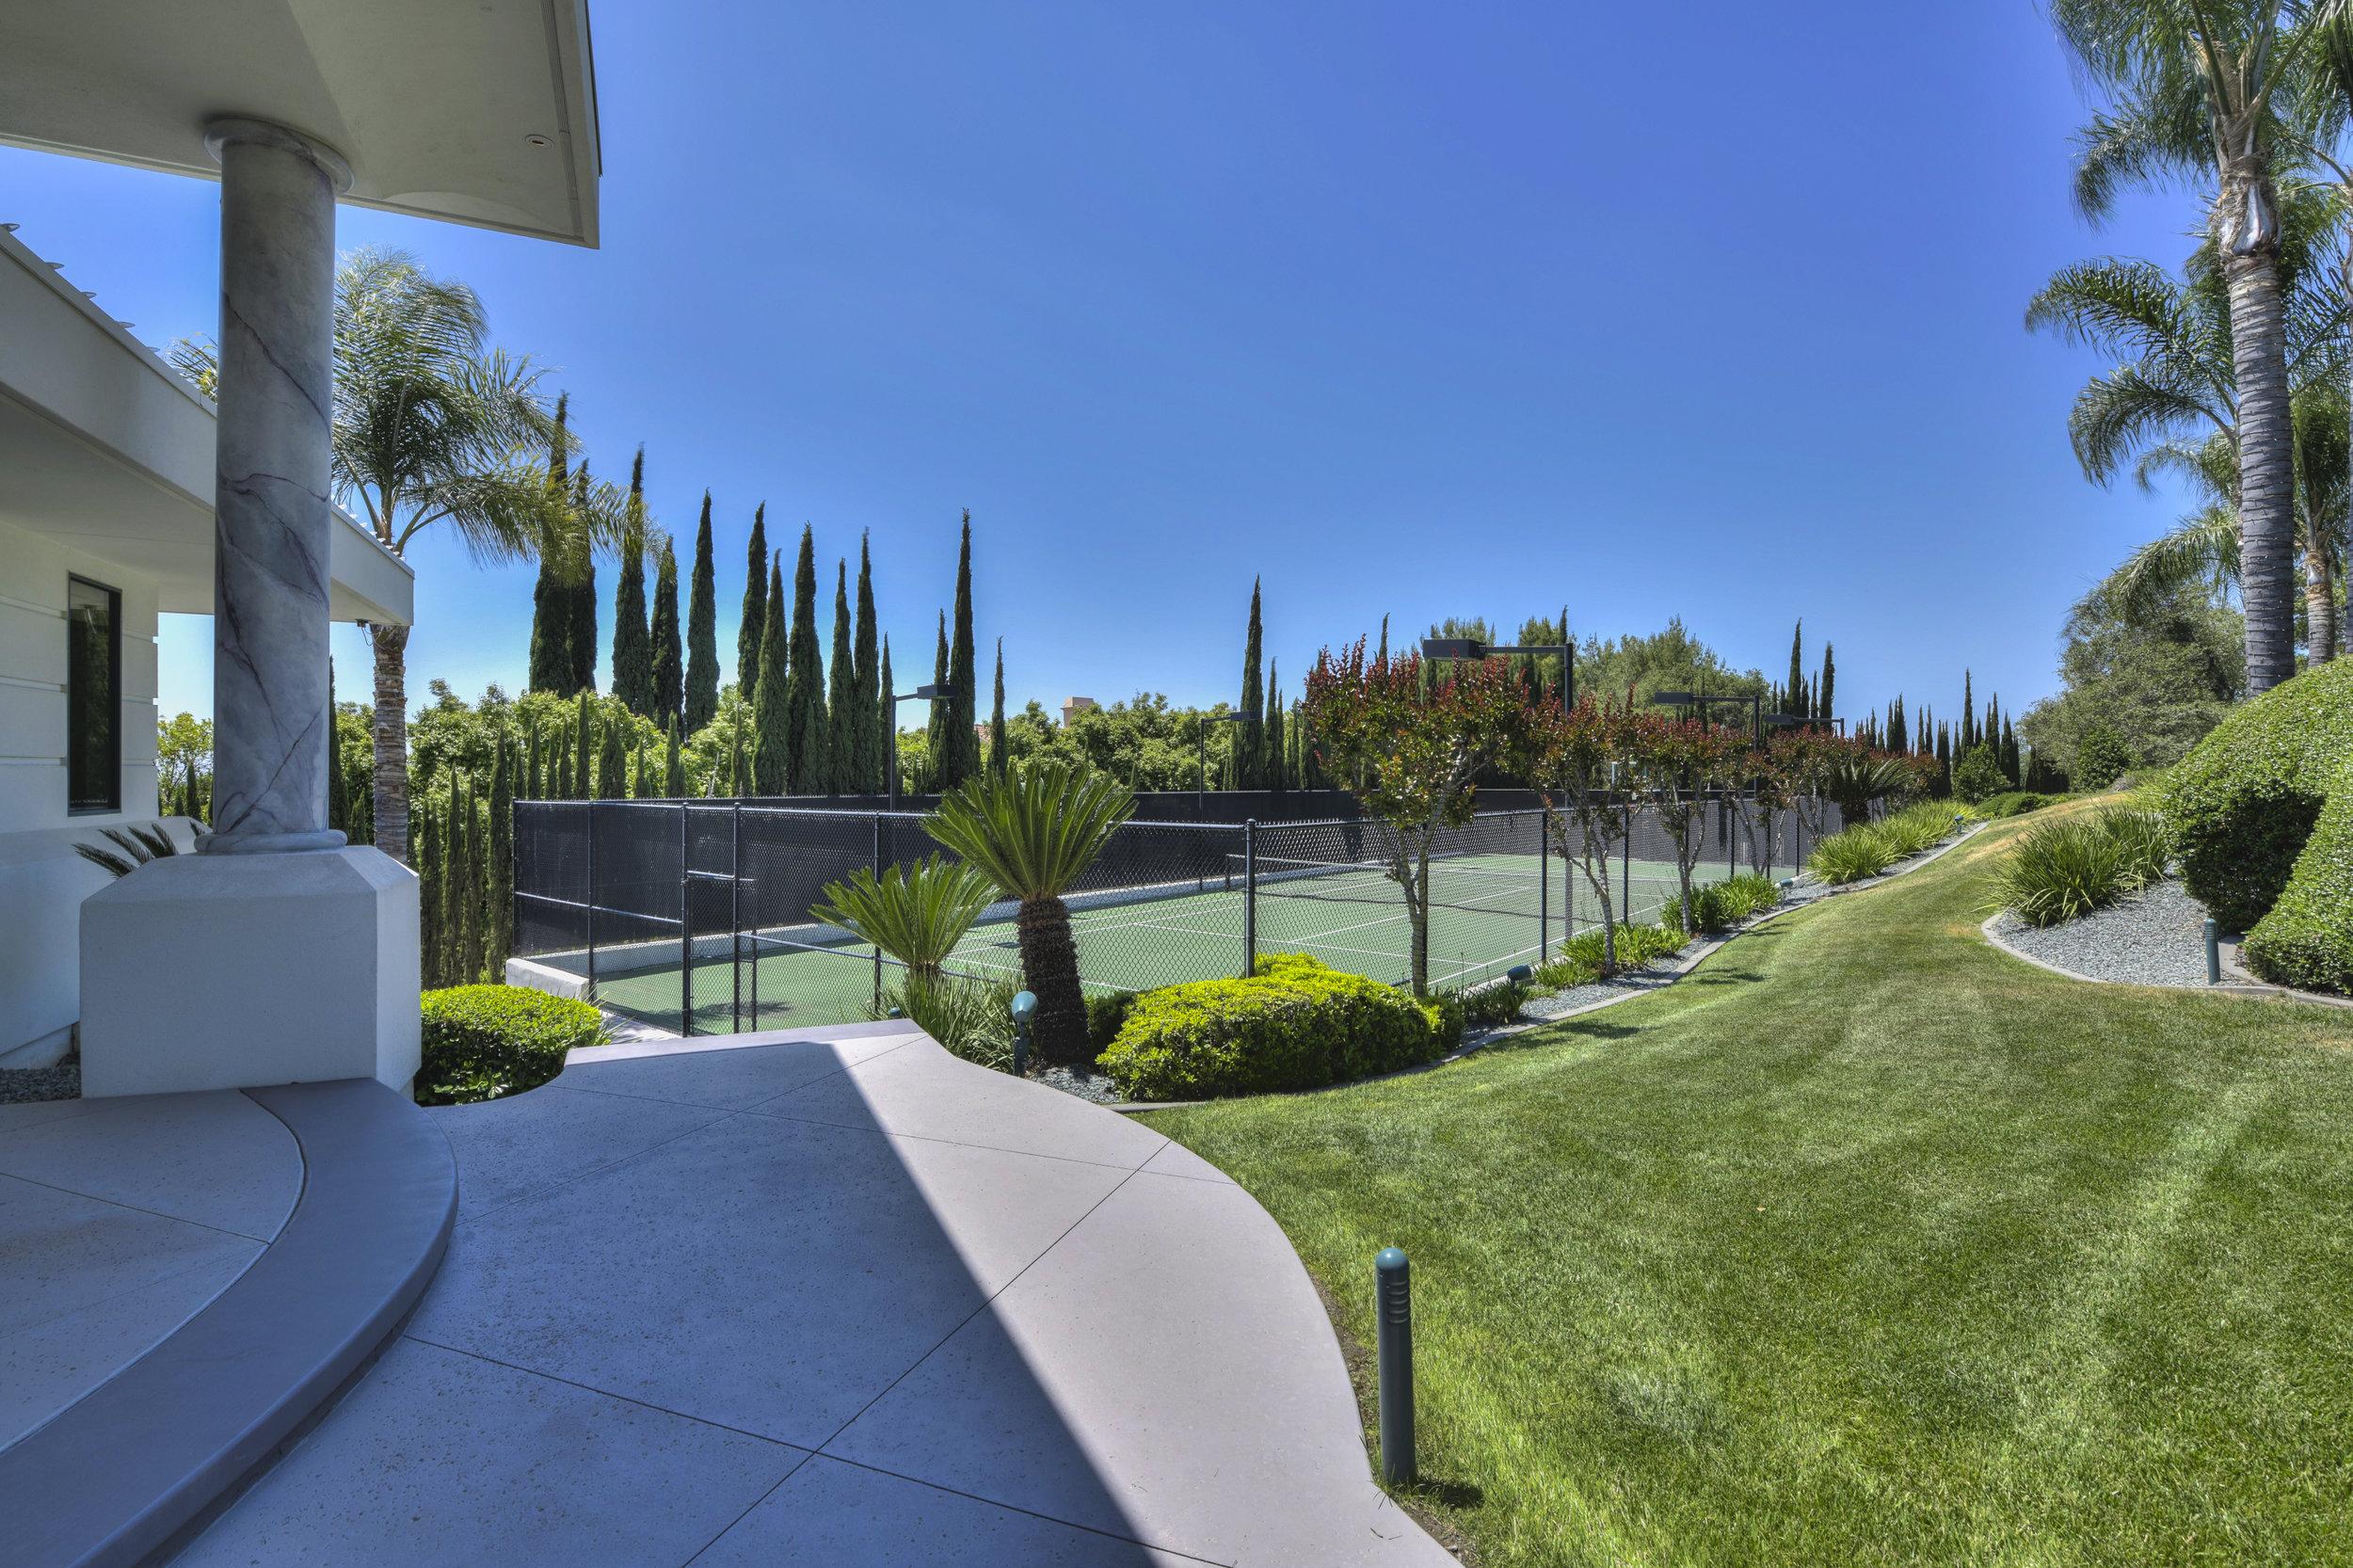 9125 Vista De Lago Court 86.jpg